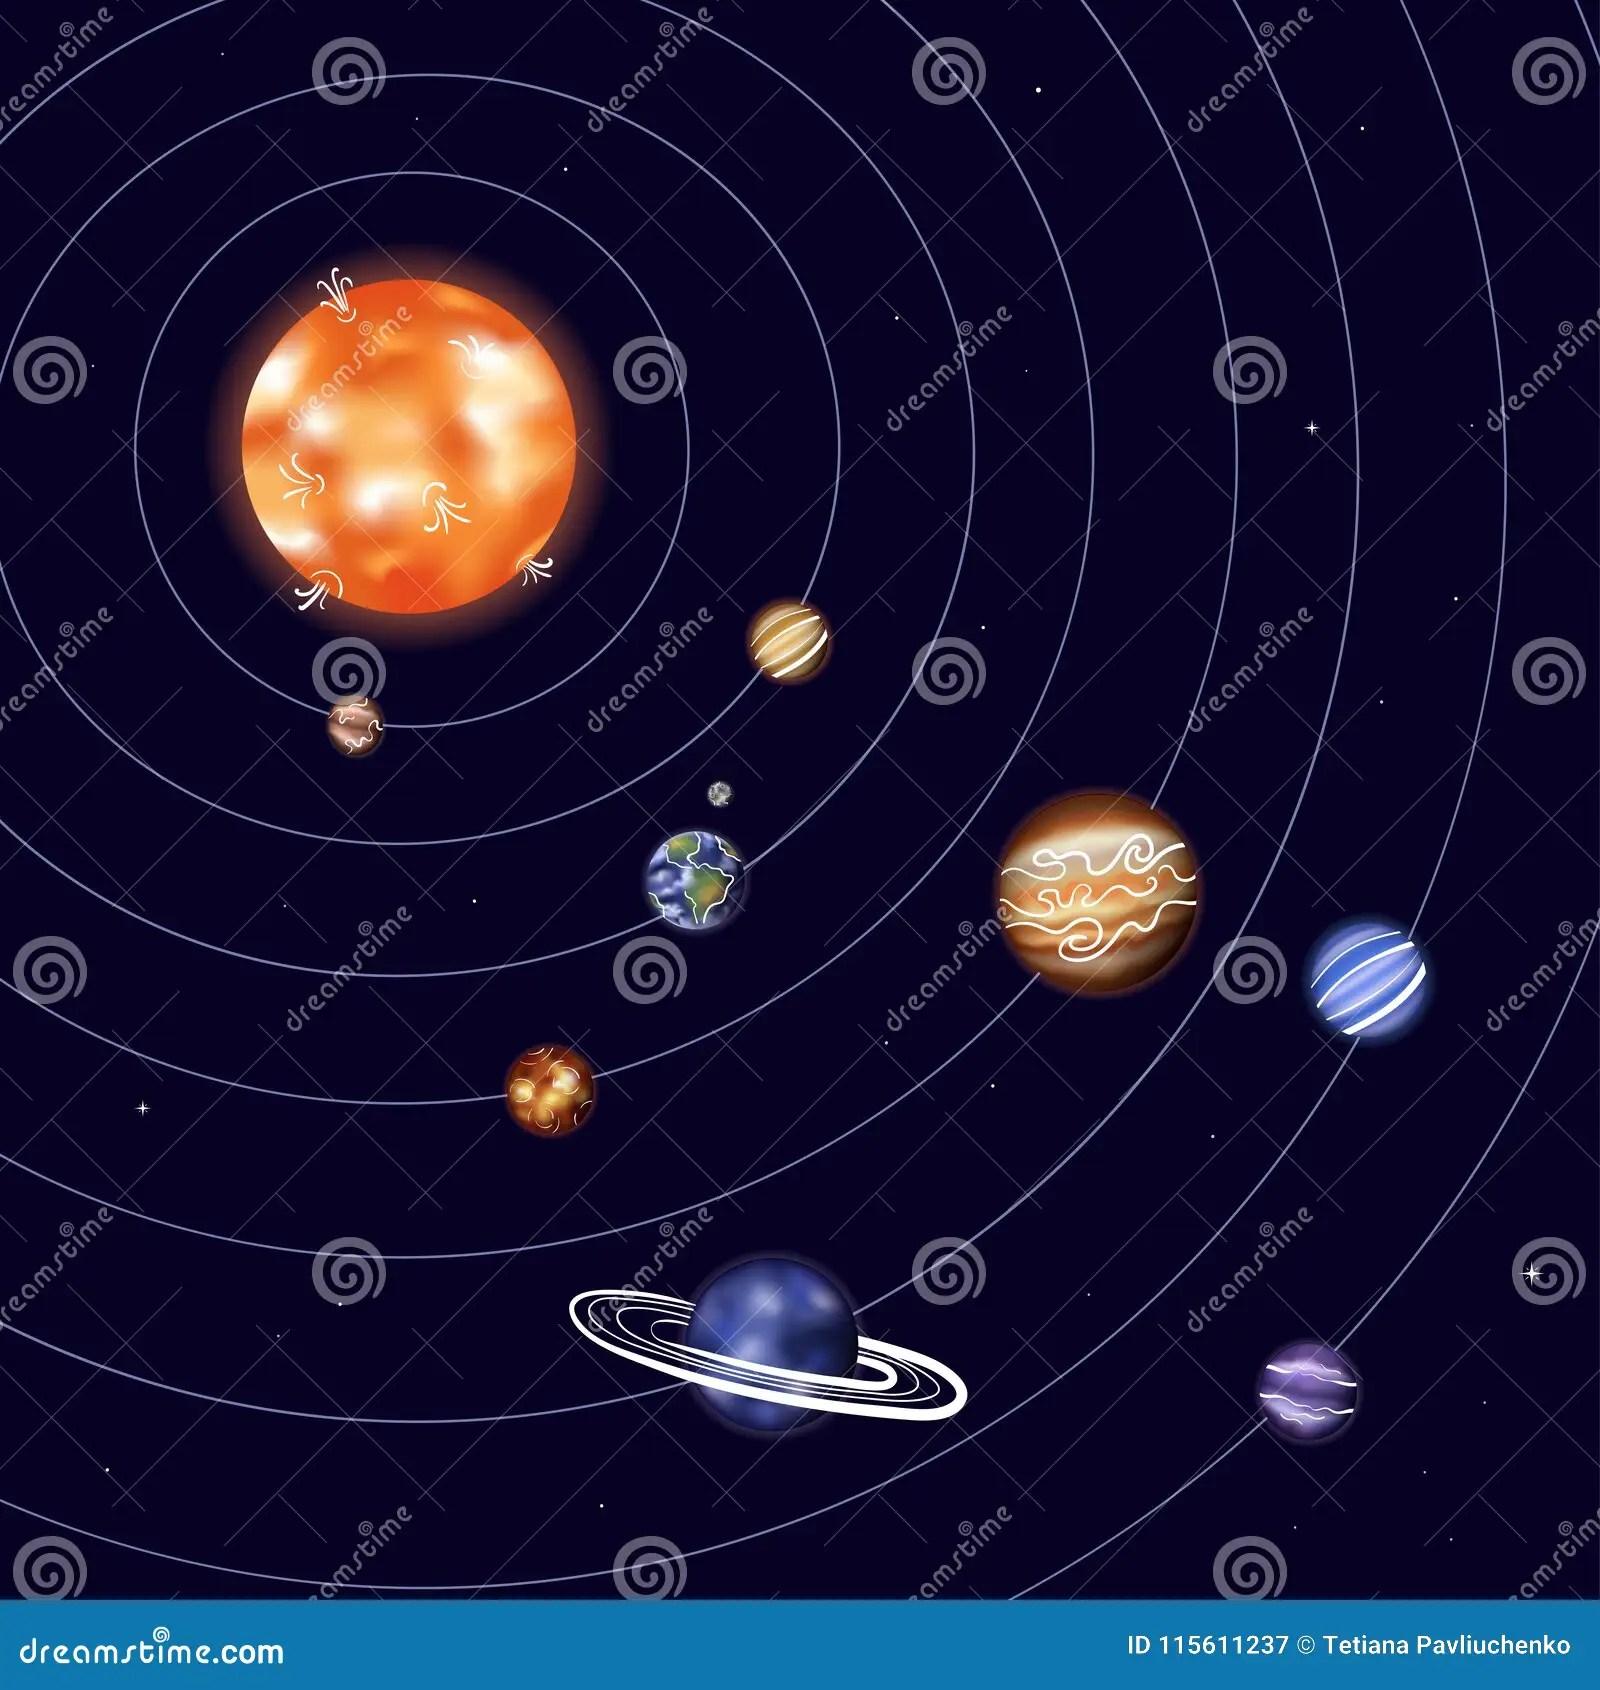 hight resolution of vector illustration of solar system with sun mercury venus earth moon mars jupiter saturn uranus neptune diagram with order of planet